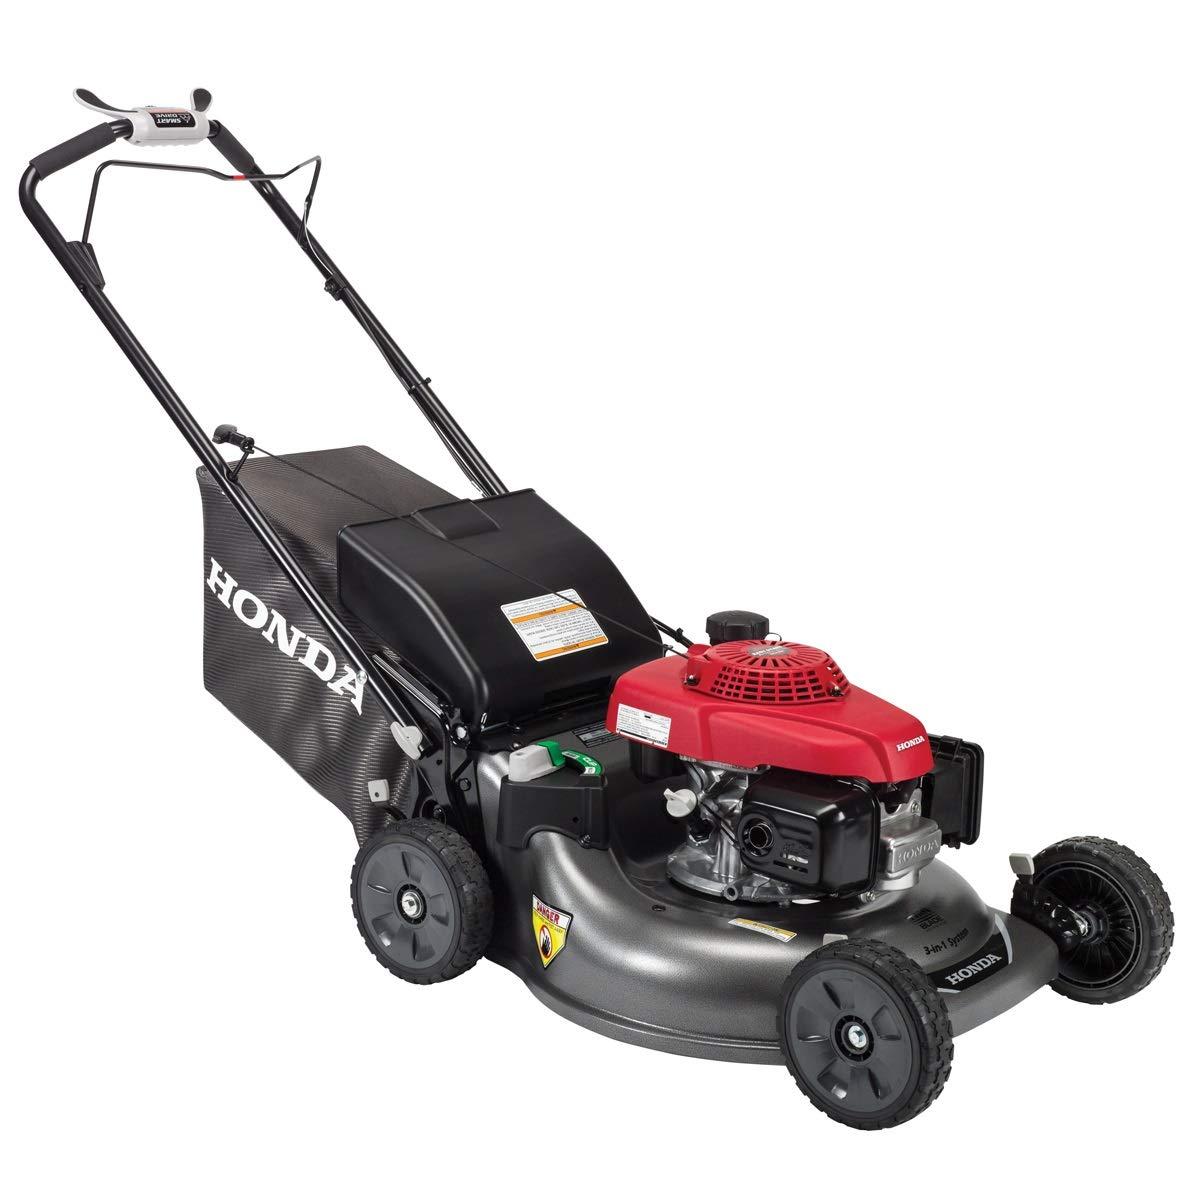 Top 10 Best Self Propelled Lawn Mower (2020 Reviews & Buying Guide) 2